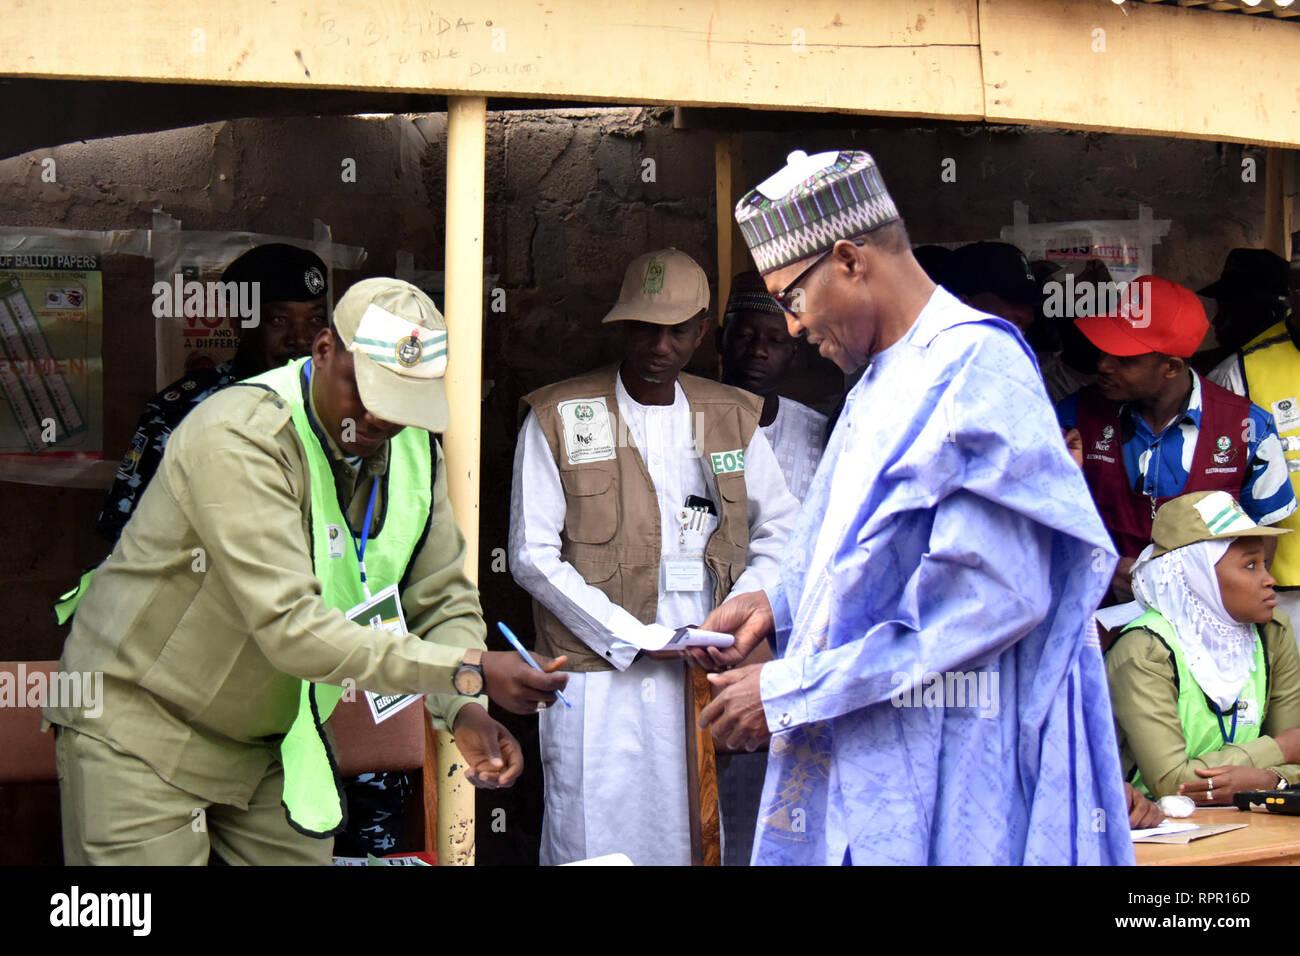 Nigeria Sugar Mama site de rencontre Keyshia ka'oir datant milliardaire